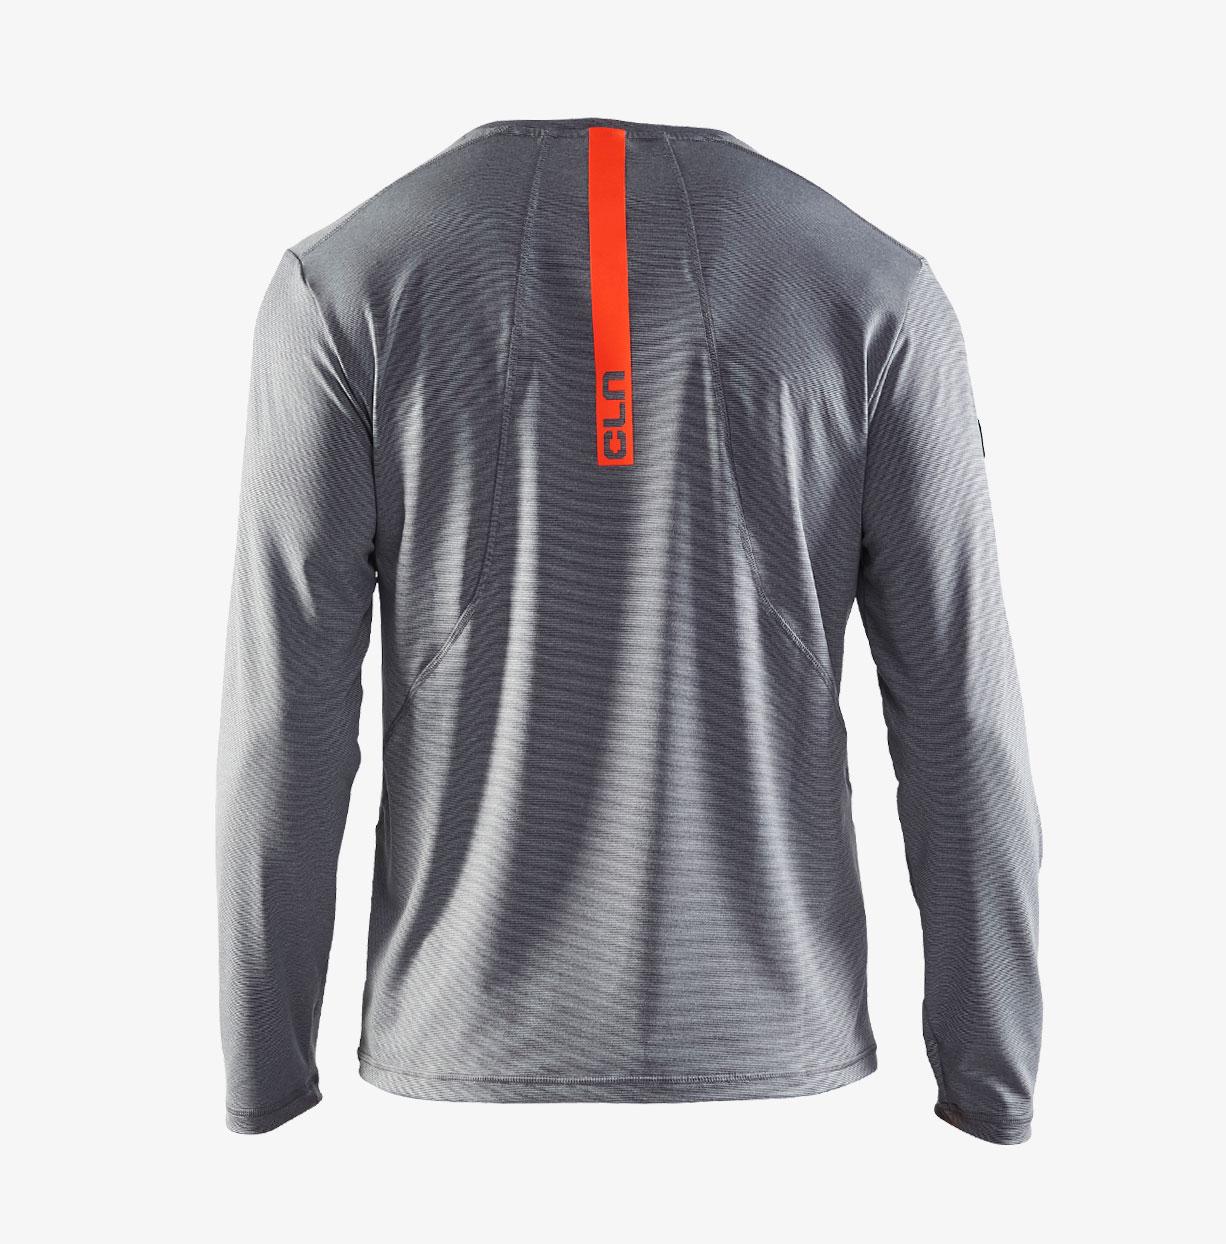 cln-ultra-longslevve-tee-grey-back